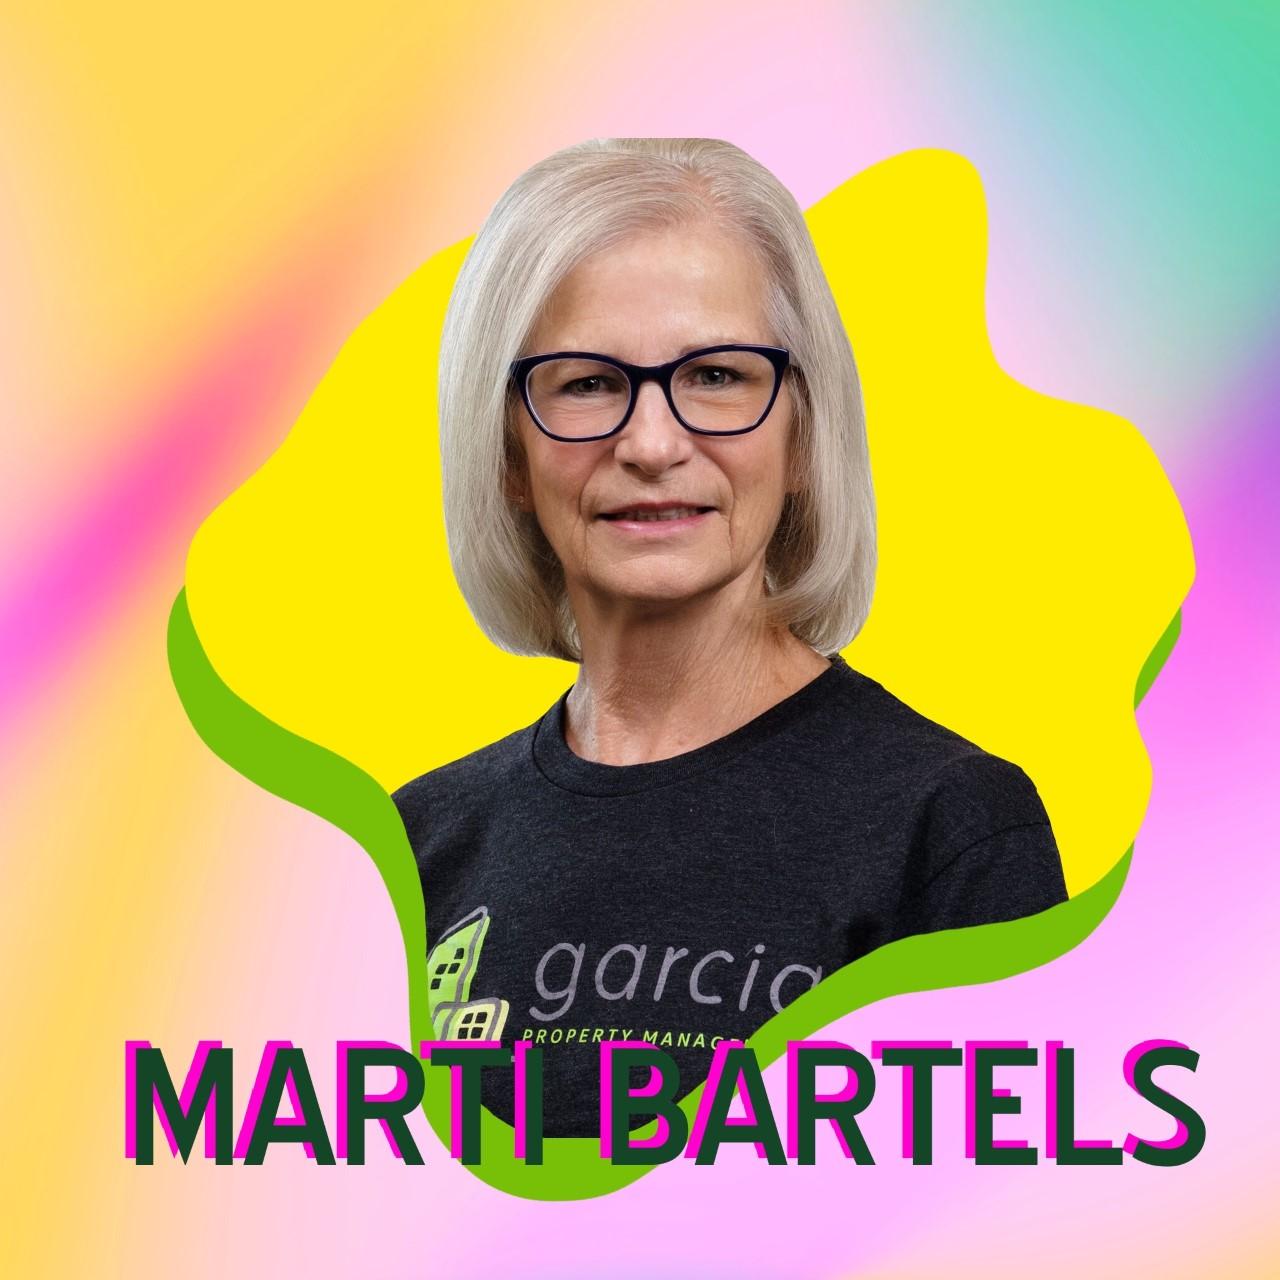 """Marti Bartels"" superimposed over her headshot"